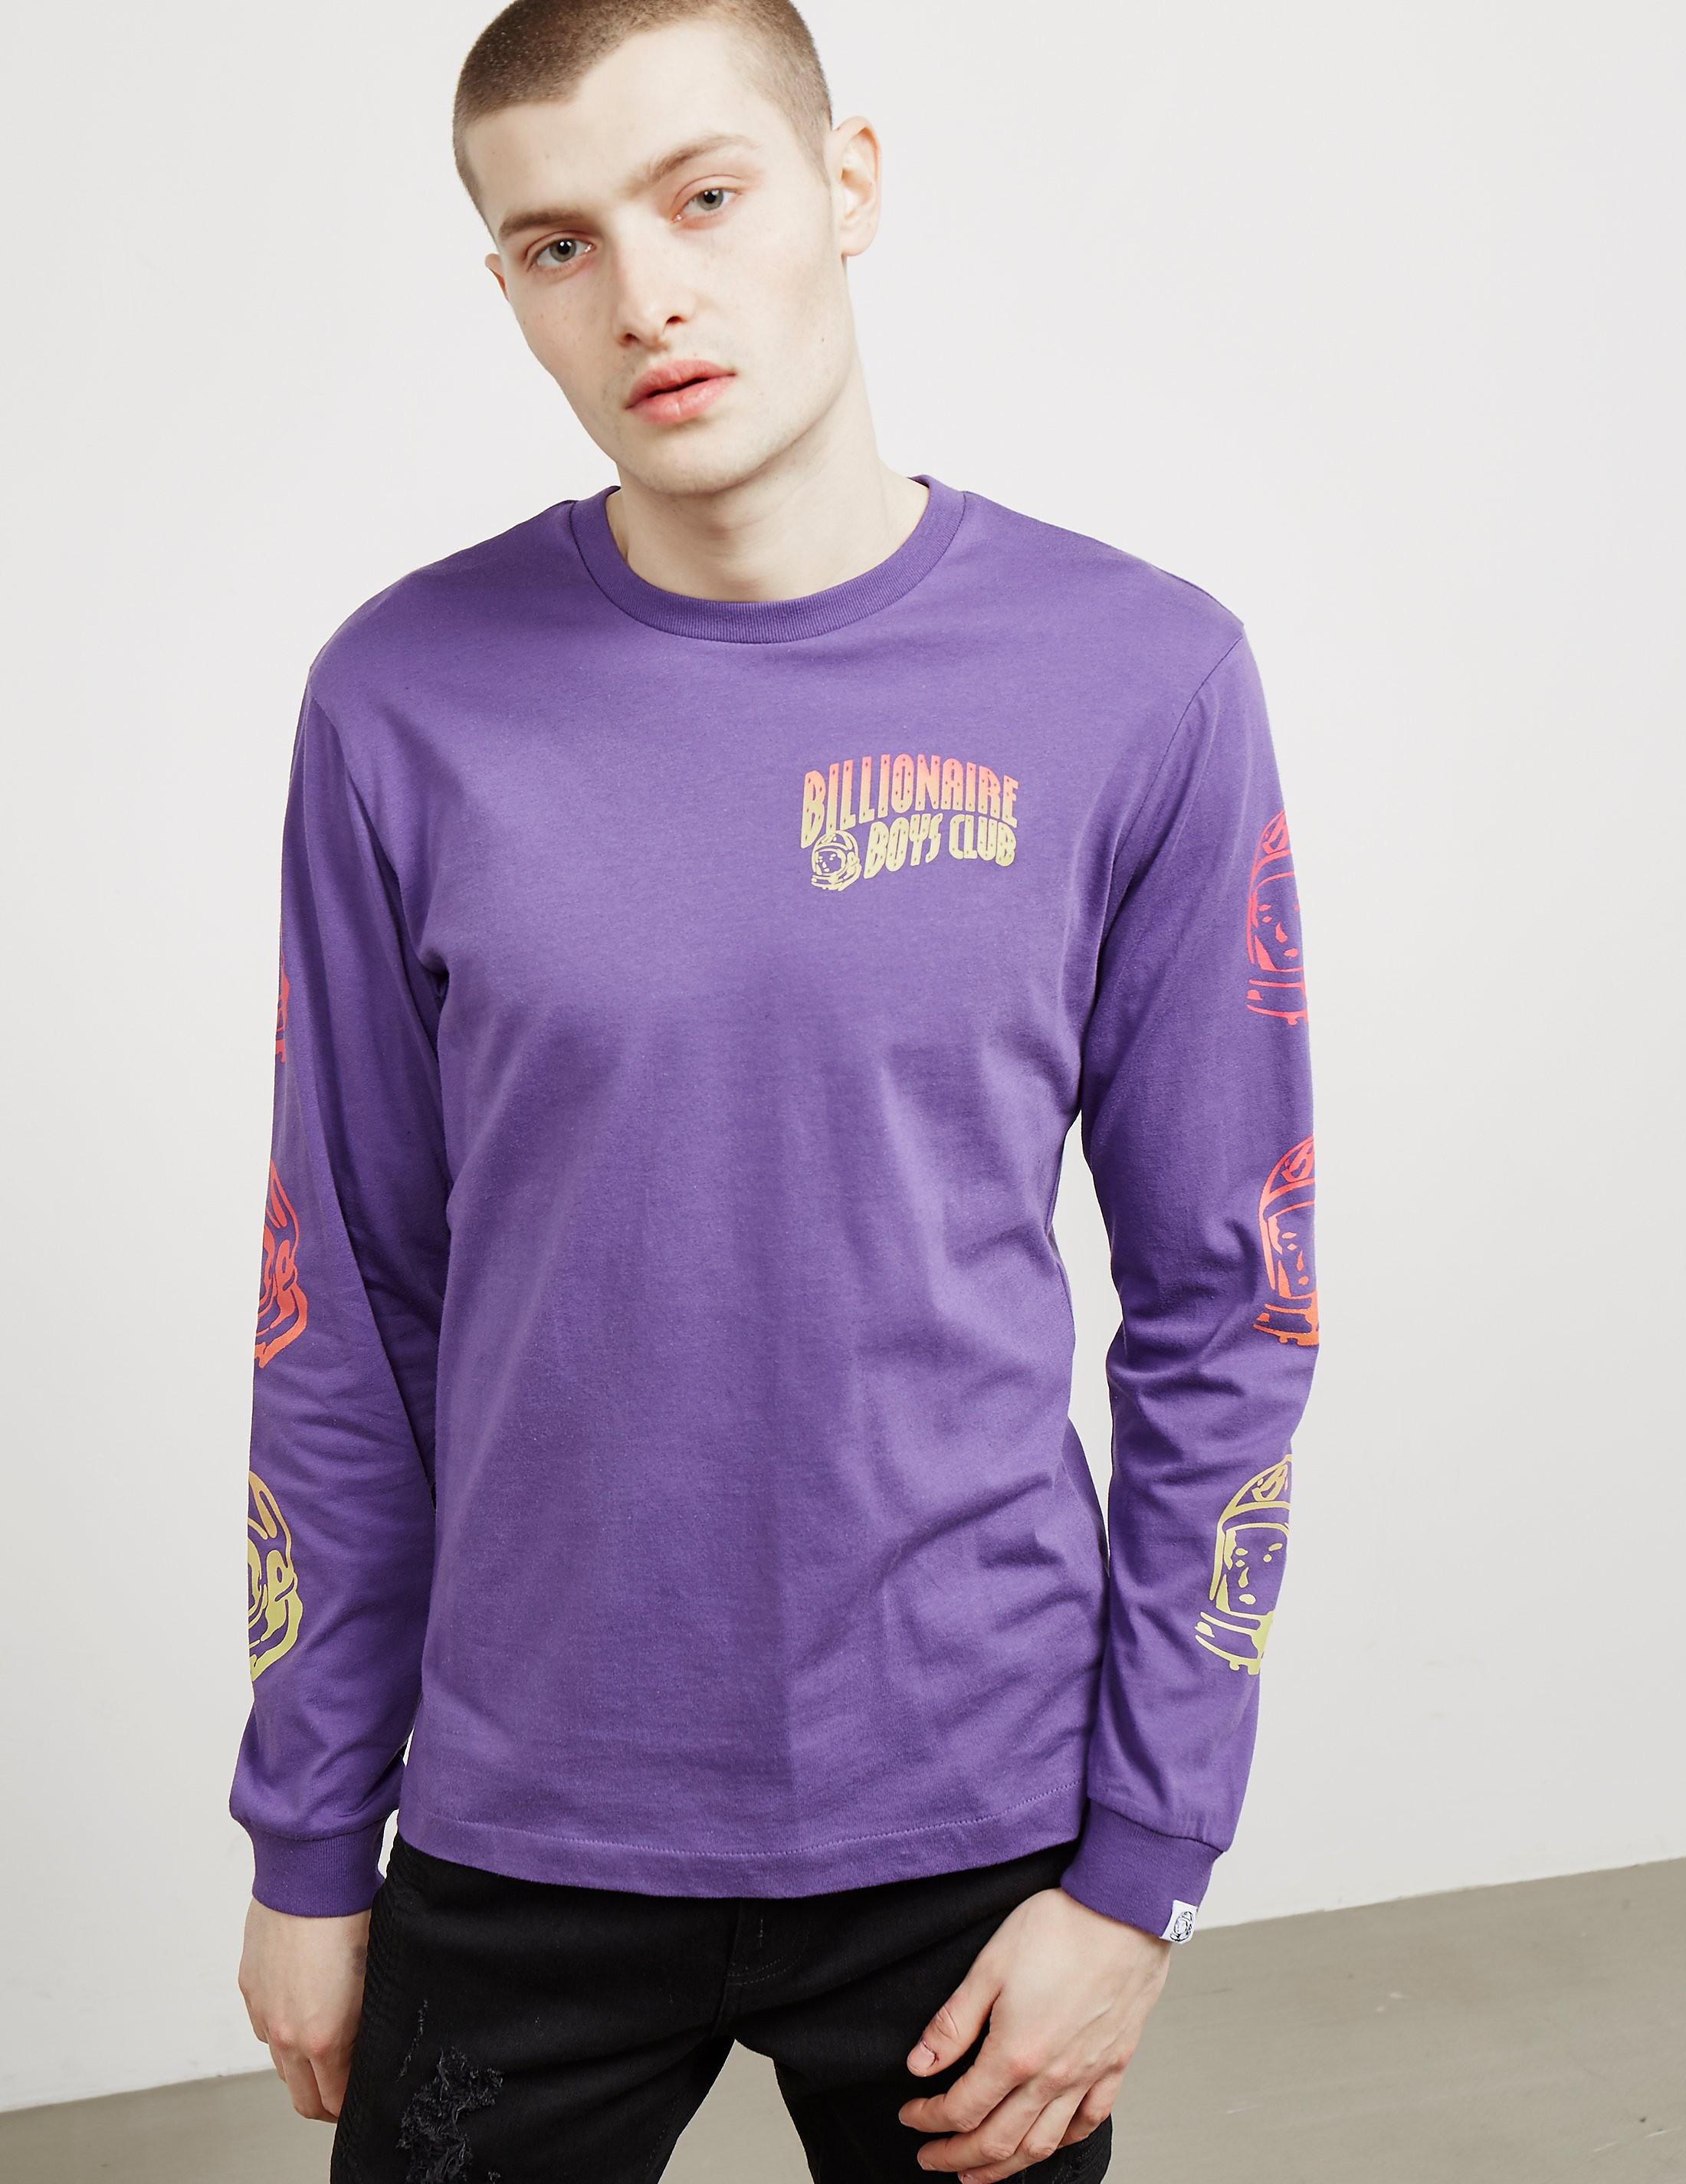 Billionaire Boys Club Helmet Long Sleeve T-Shirt